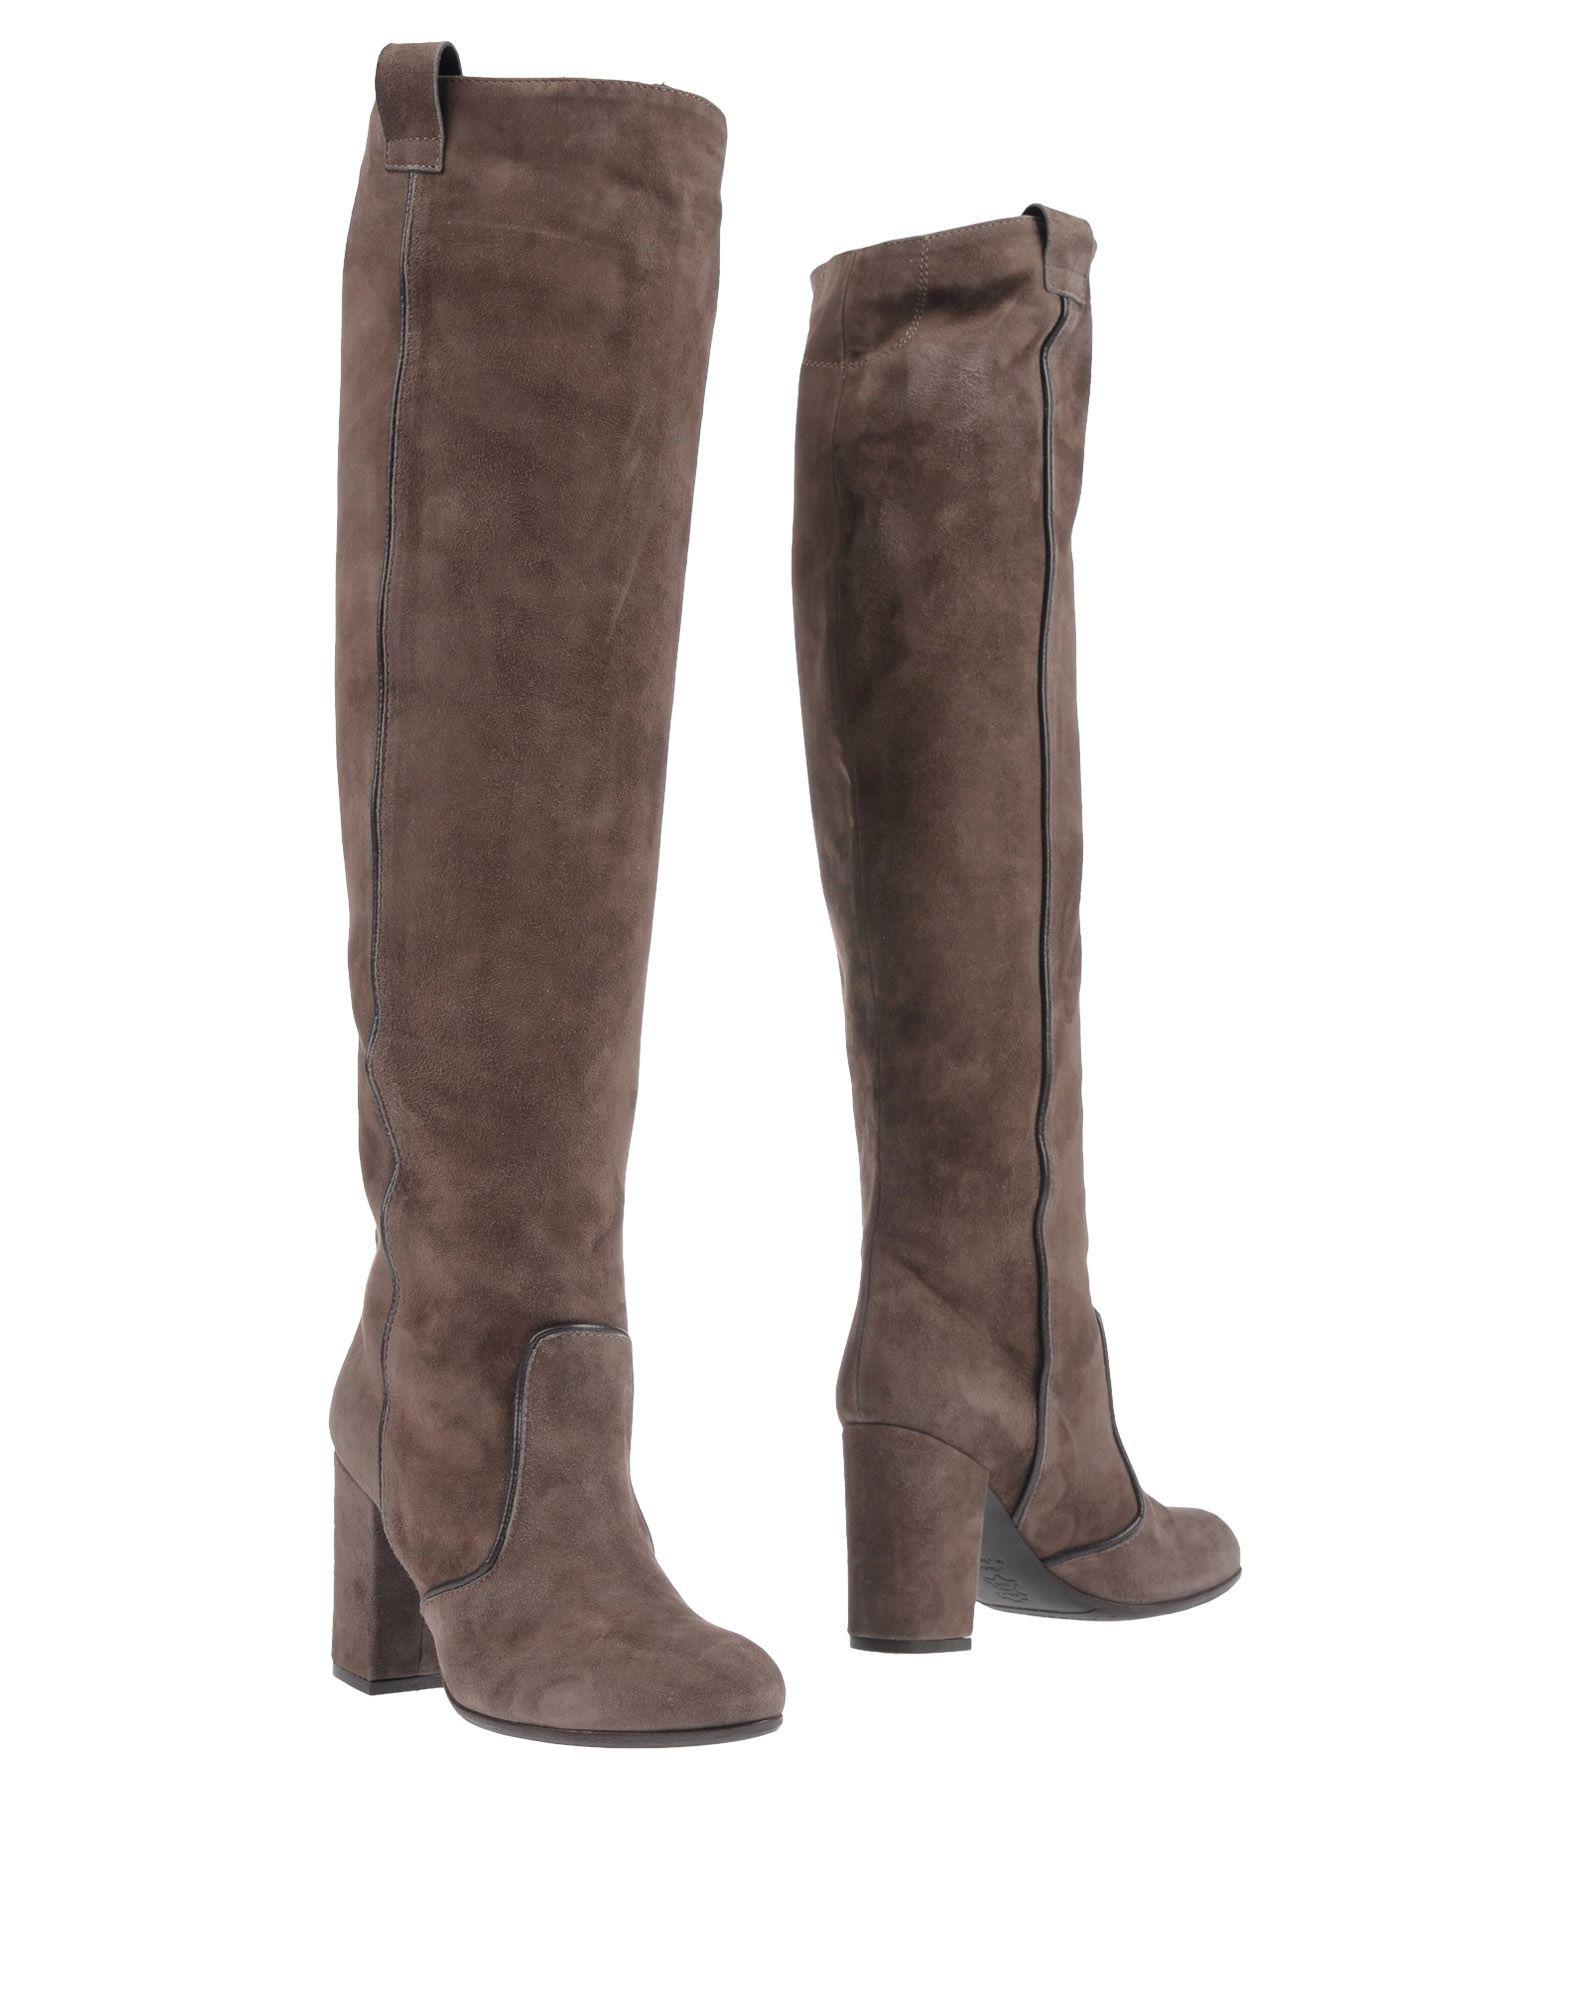 Paris Texas Boots Boots - Women Paris Texas Boots Boots online on  Australia - 11205649WF 18f921